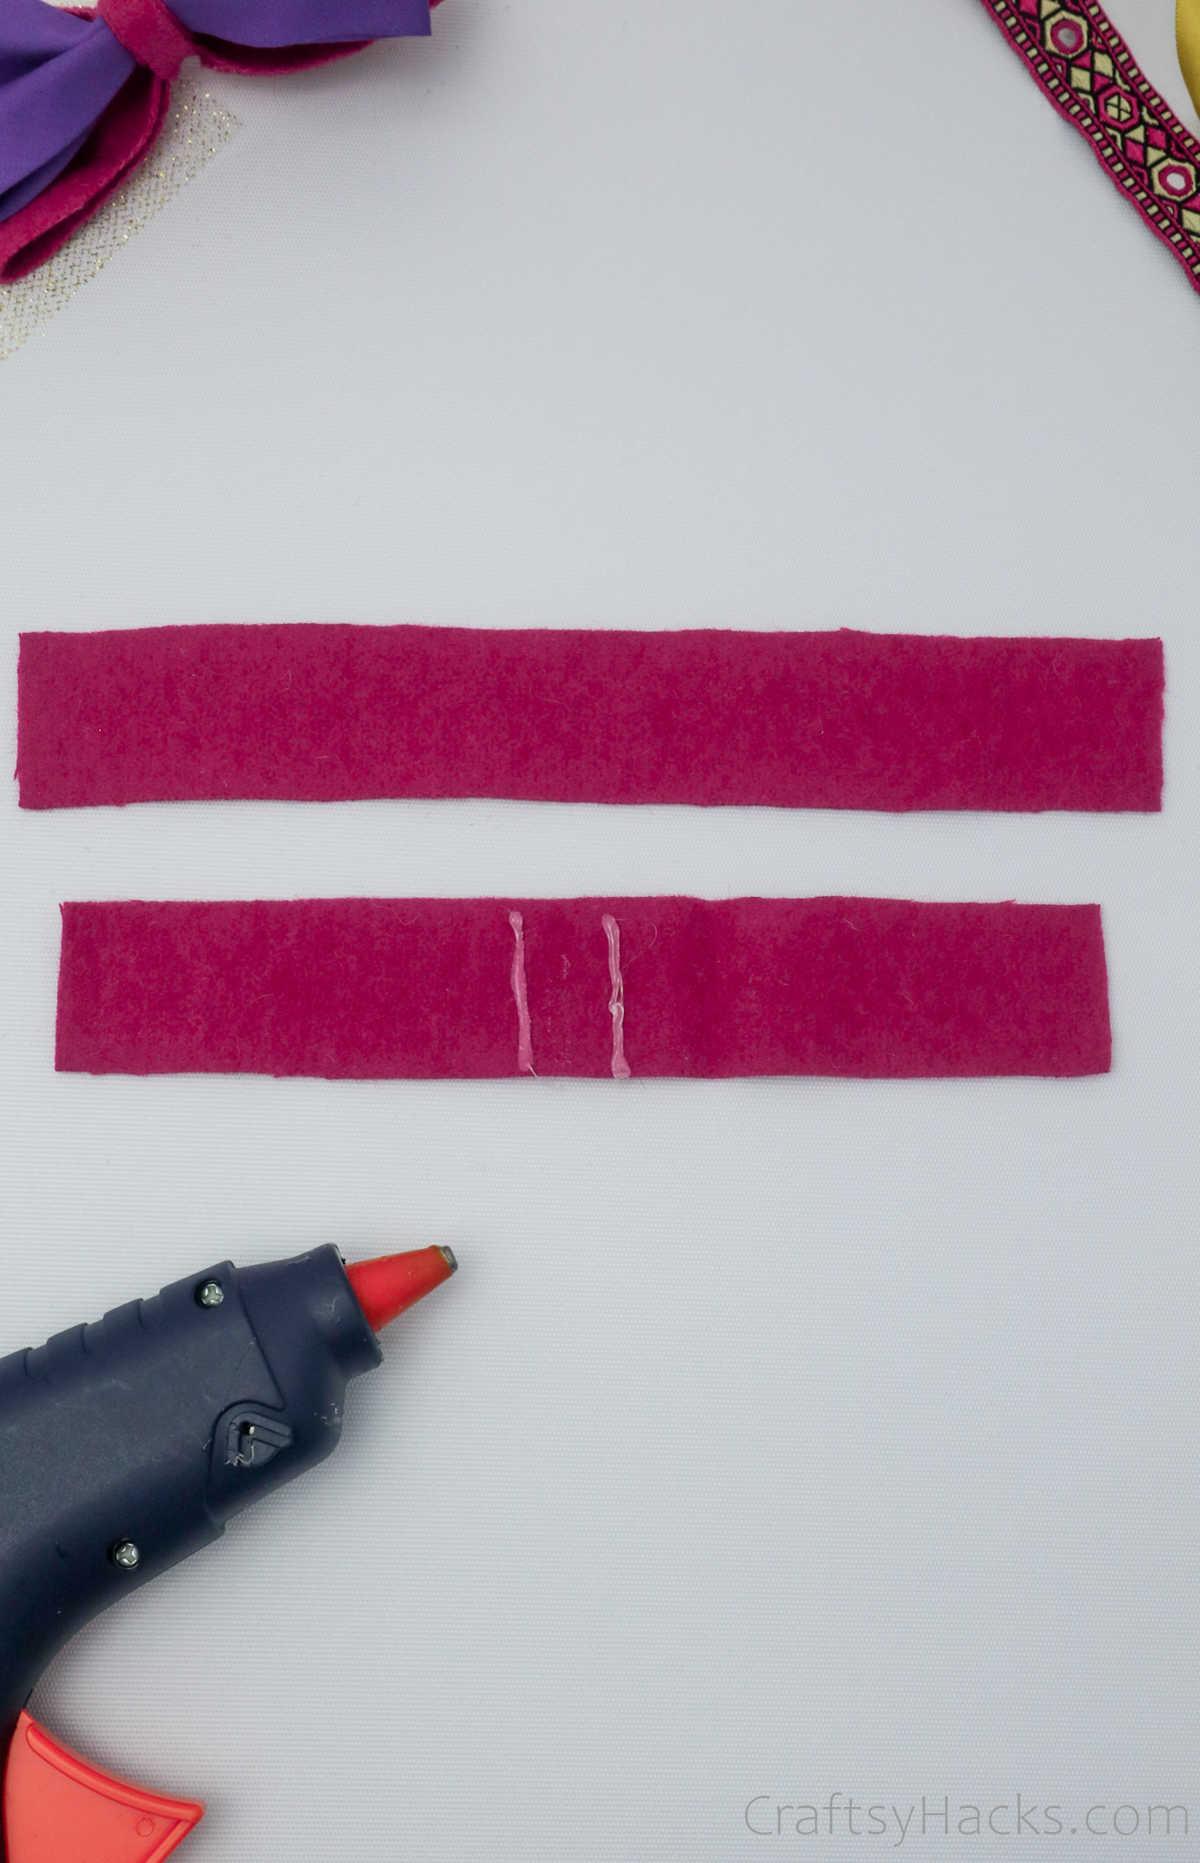 hot glue on pink felt piece